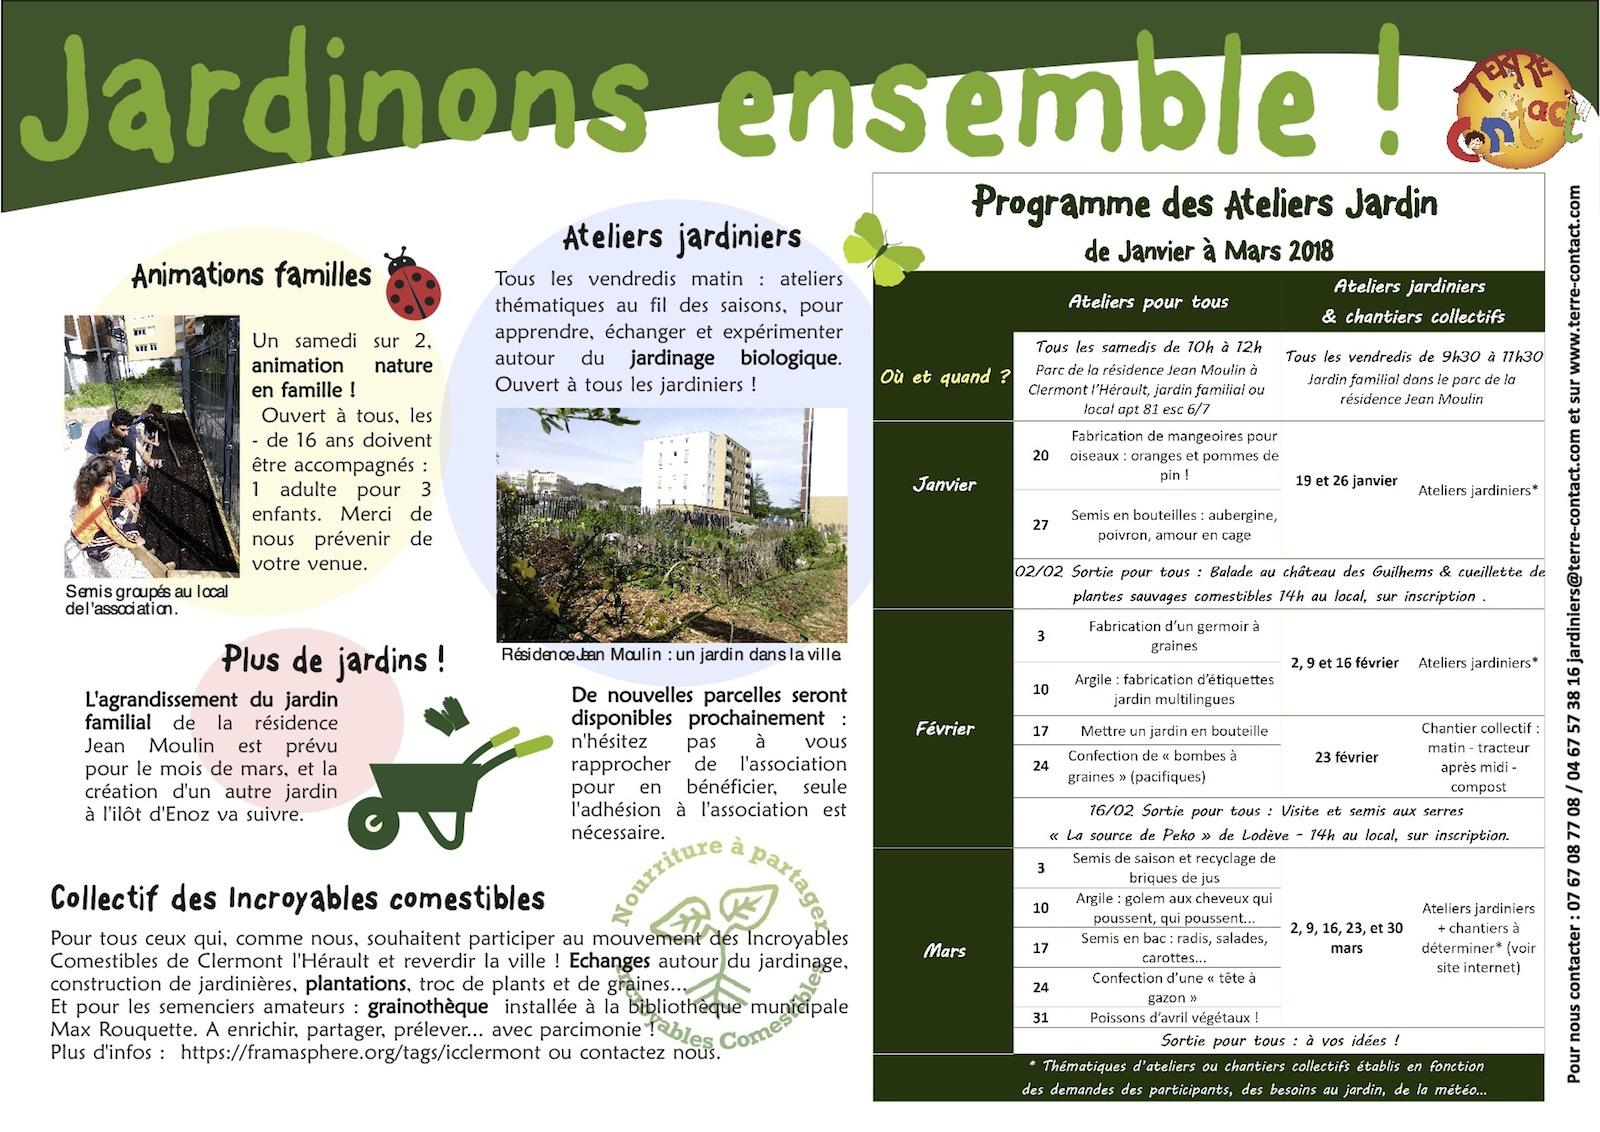 Programme des ateliers jardins terre contact for Programme jardin